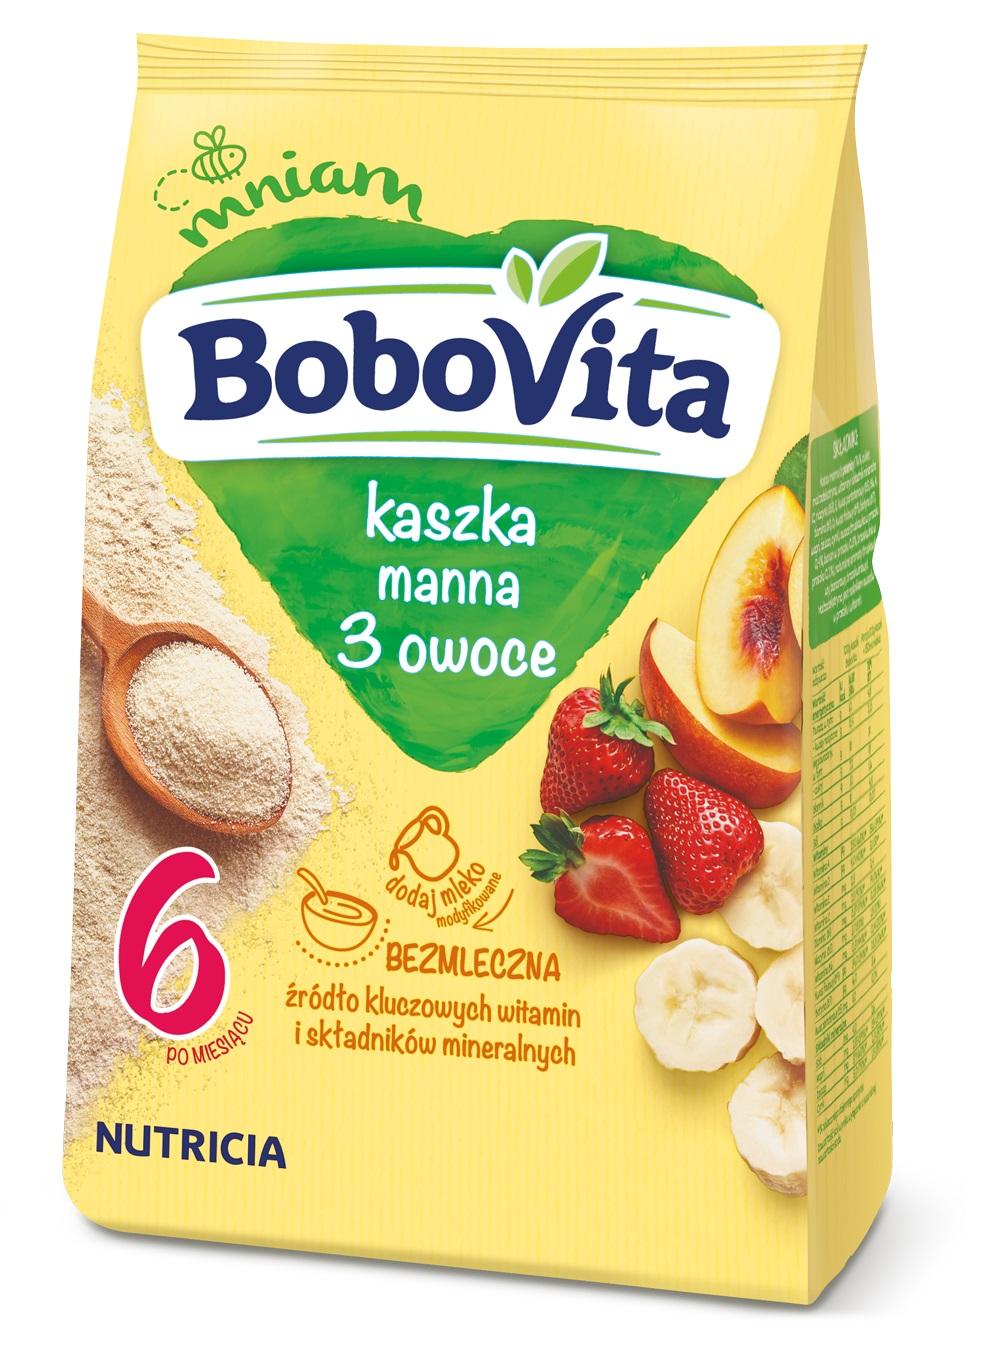 Poznaj bezmleczne kaszki BoboVita